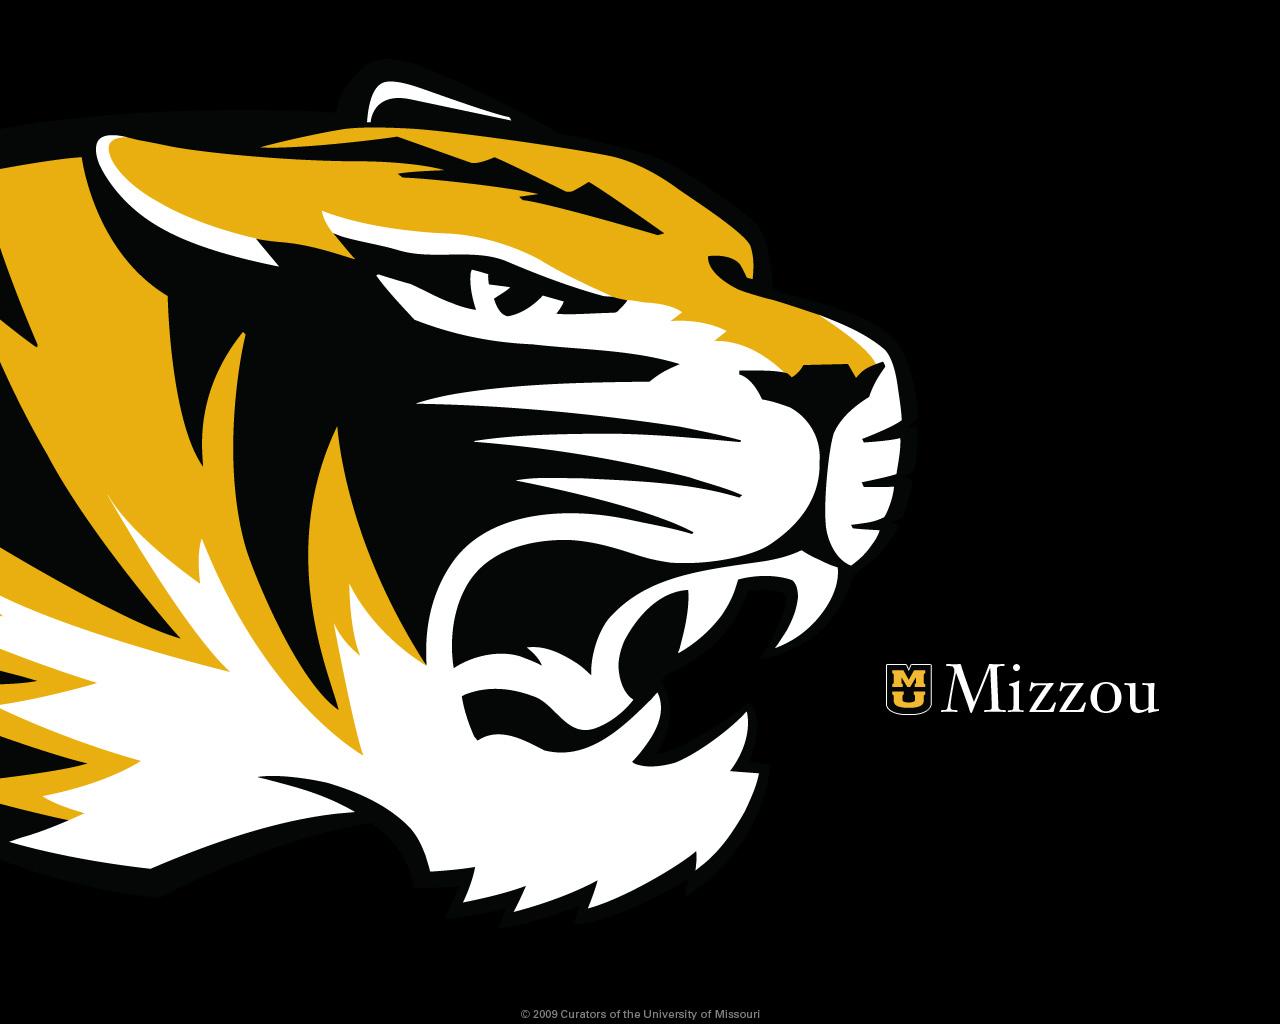 Wallpapers University Of Missouri Mizzou Tigers Ipad Wallpapers 1280x1024